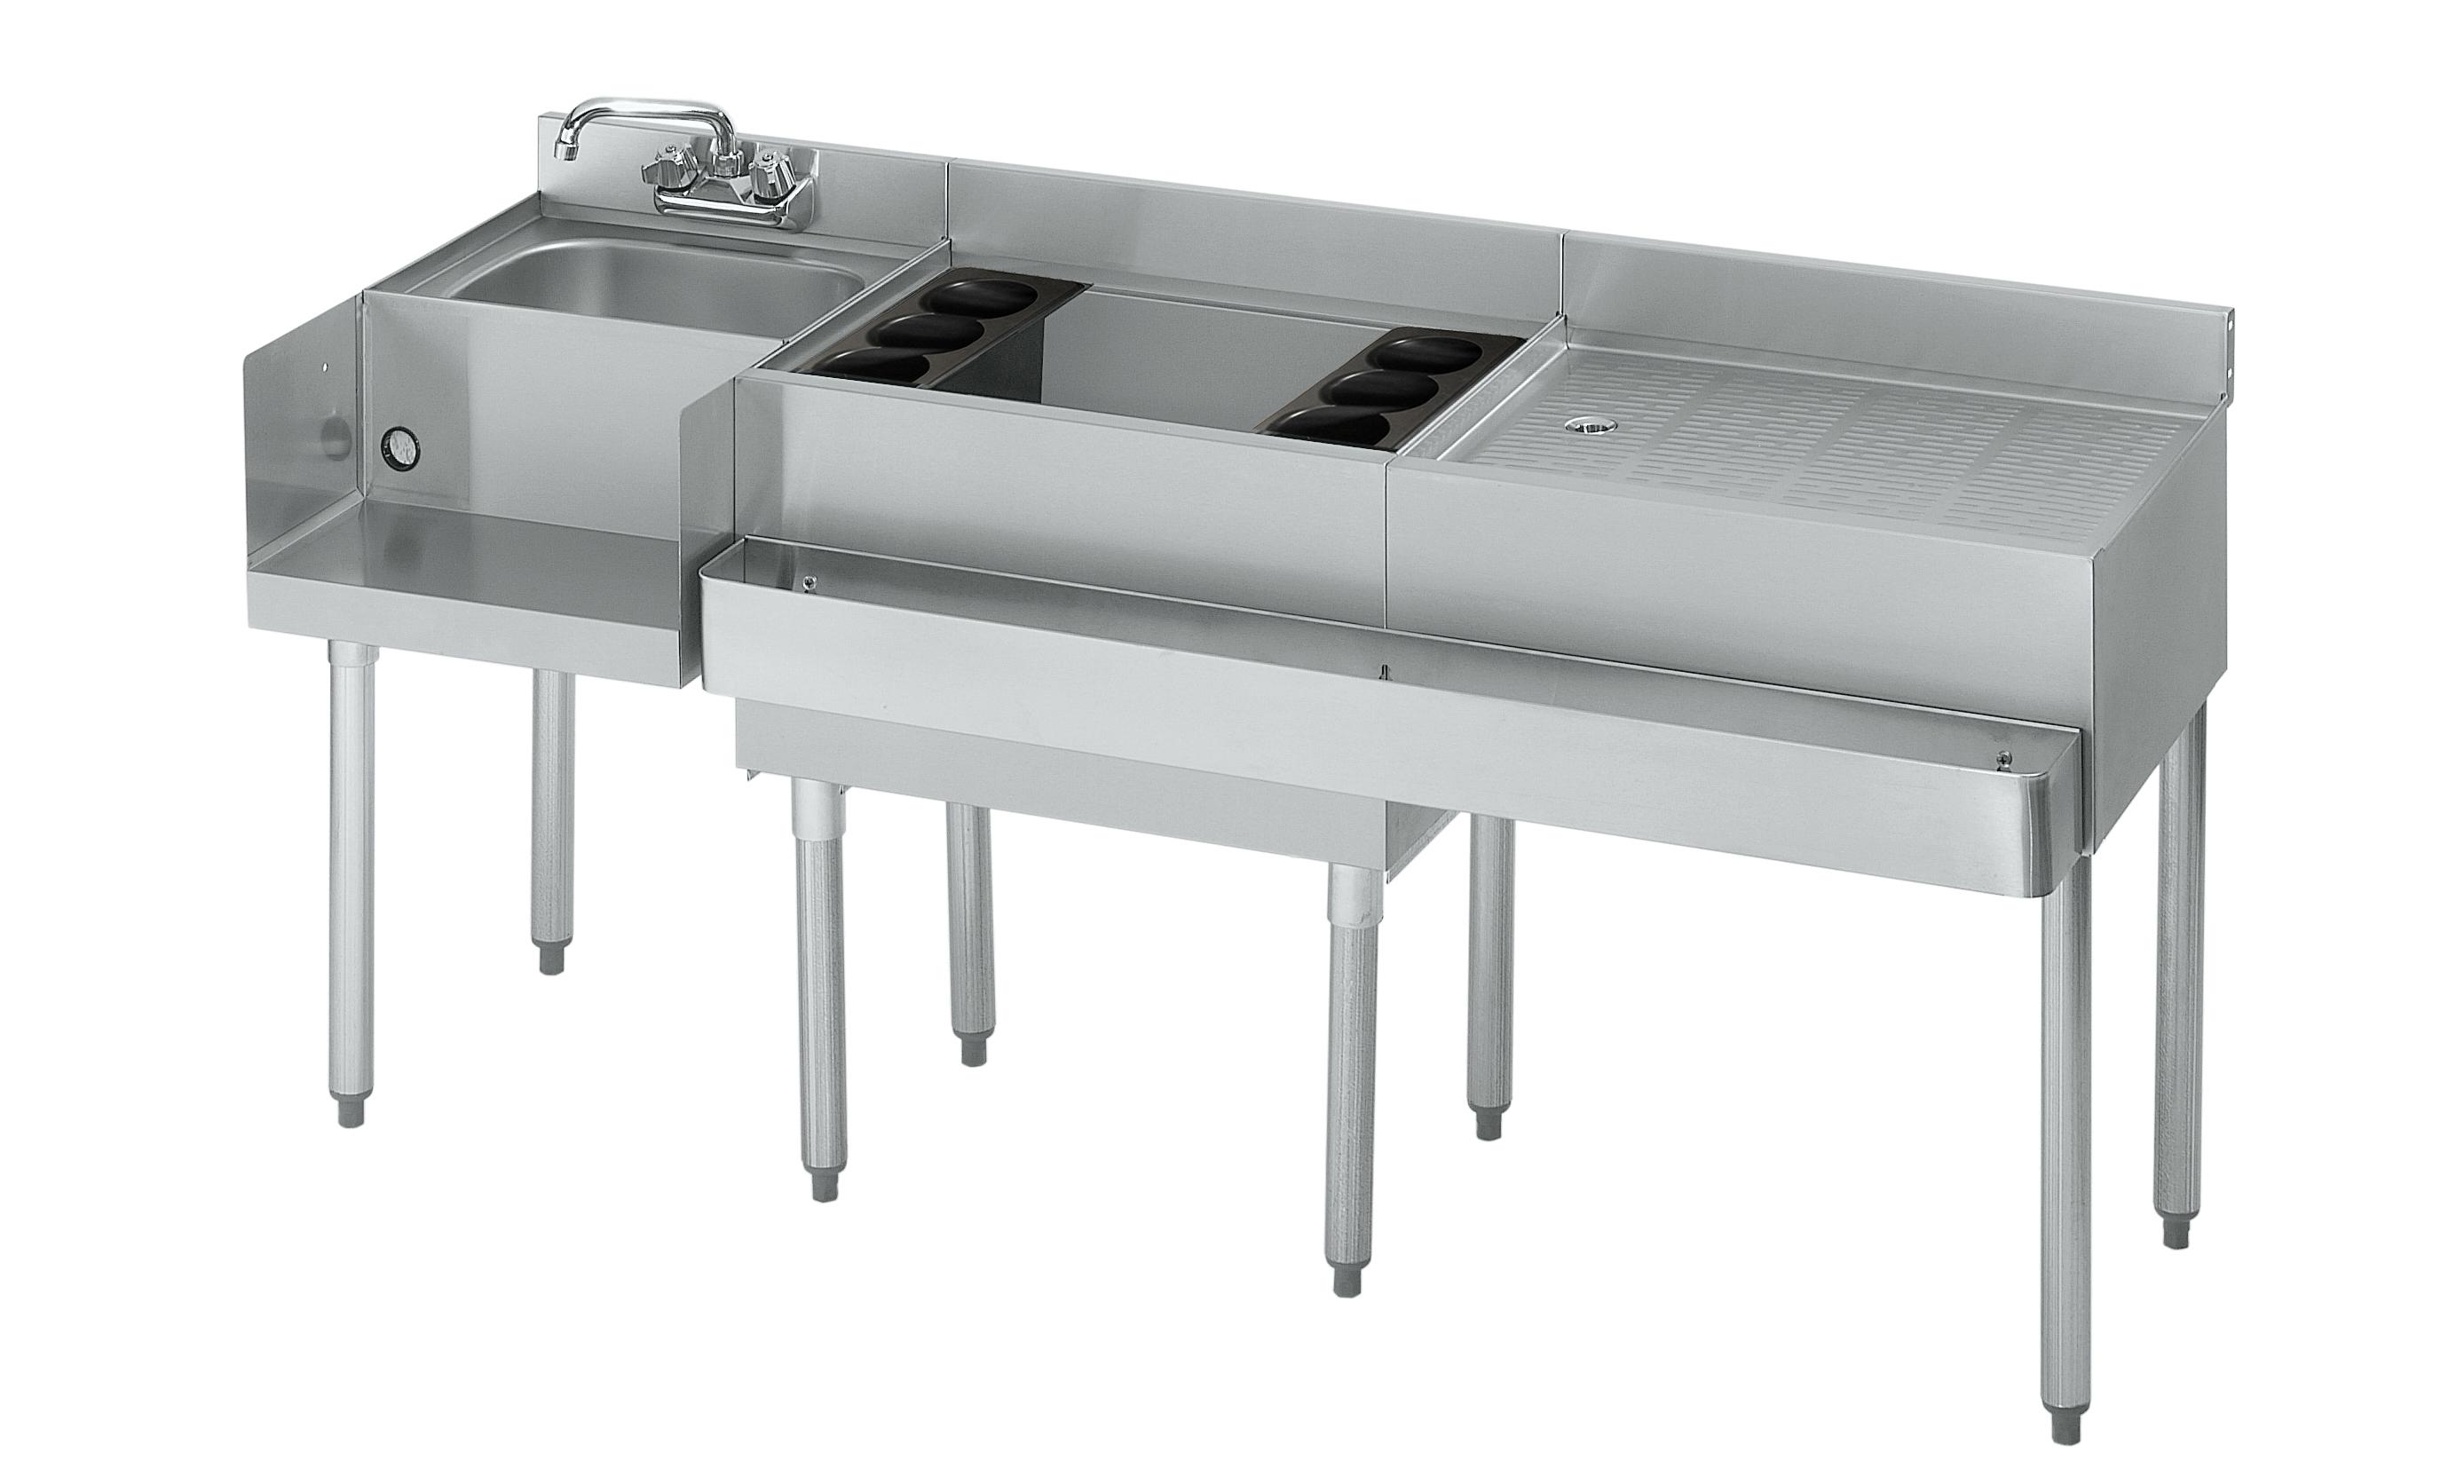 Krowne Metal 18-W66L-7 underbar ice bin/cocktail station, blender station